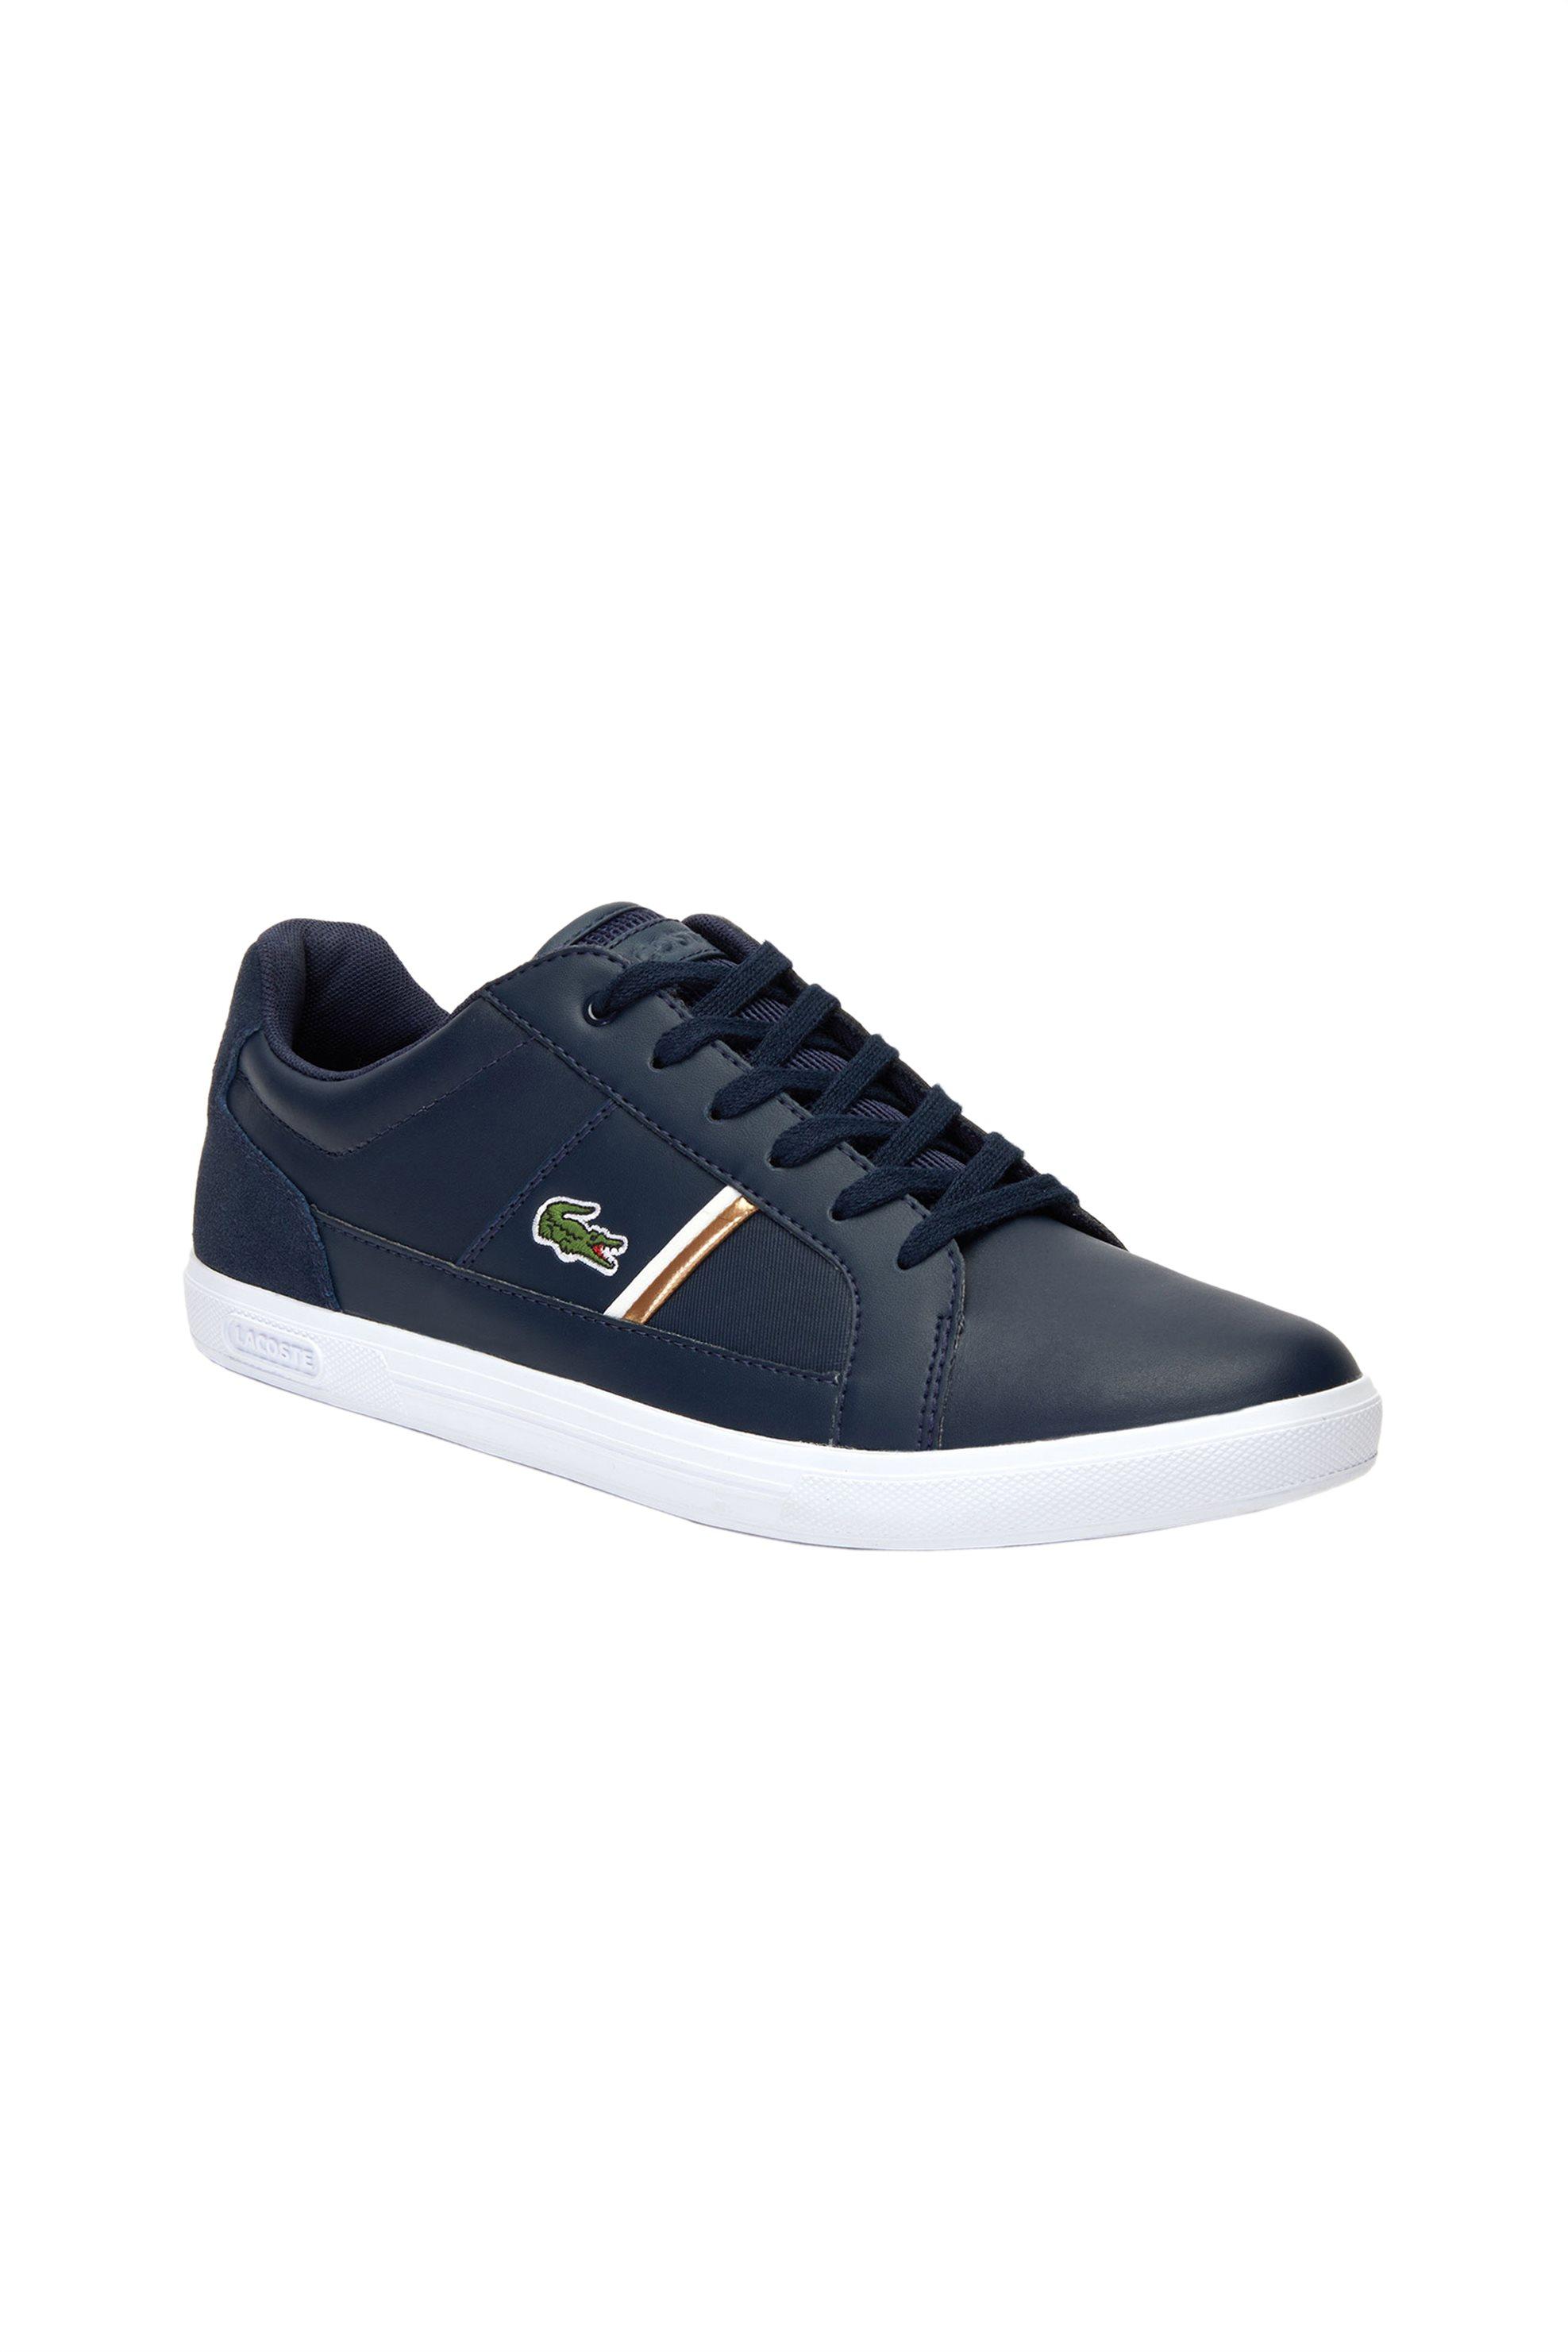 Lacoste ανδρικά sneakers με κορδόνια και ριγέ λεπτομέρεια Europa – 38SMA0017092 – Μπλε Σκούρο